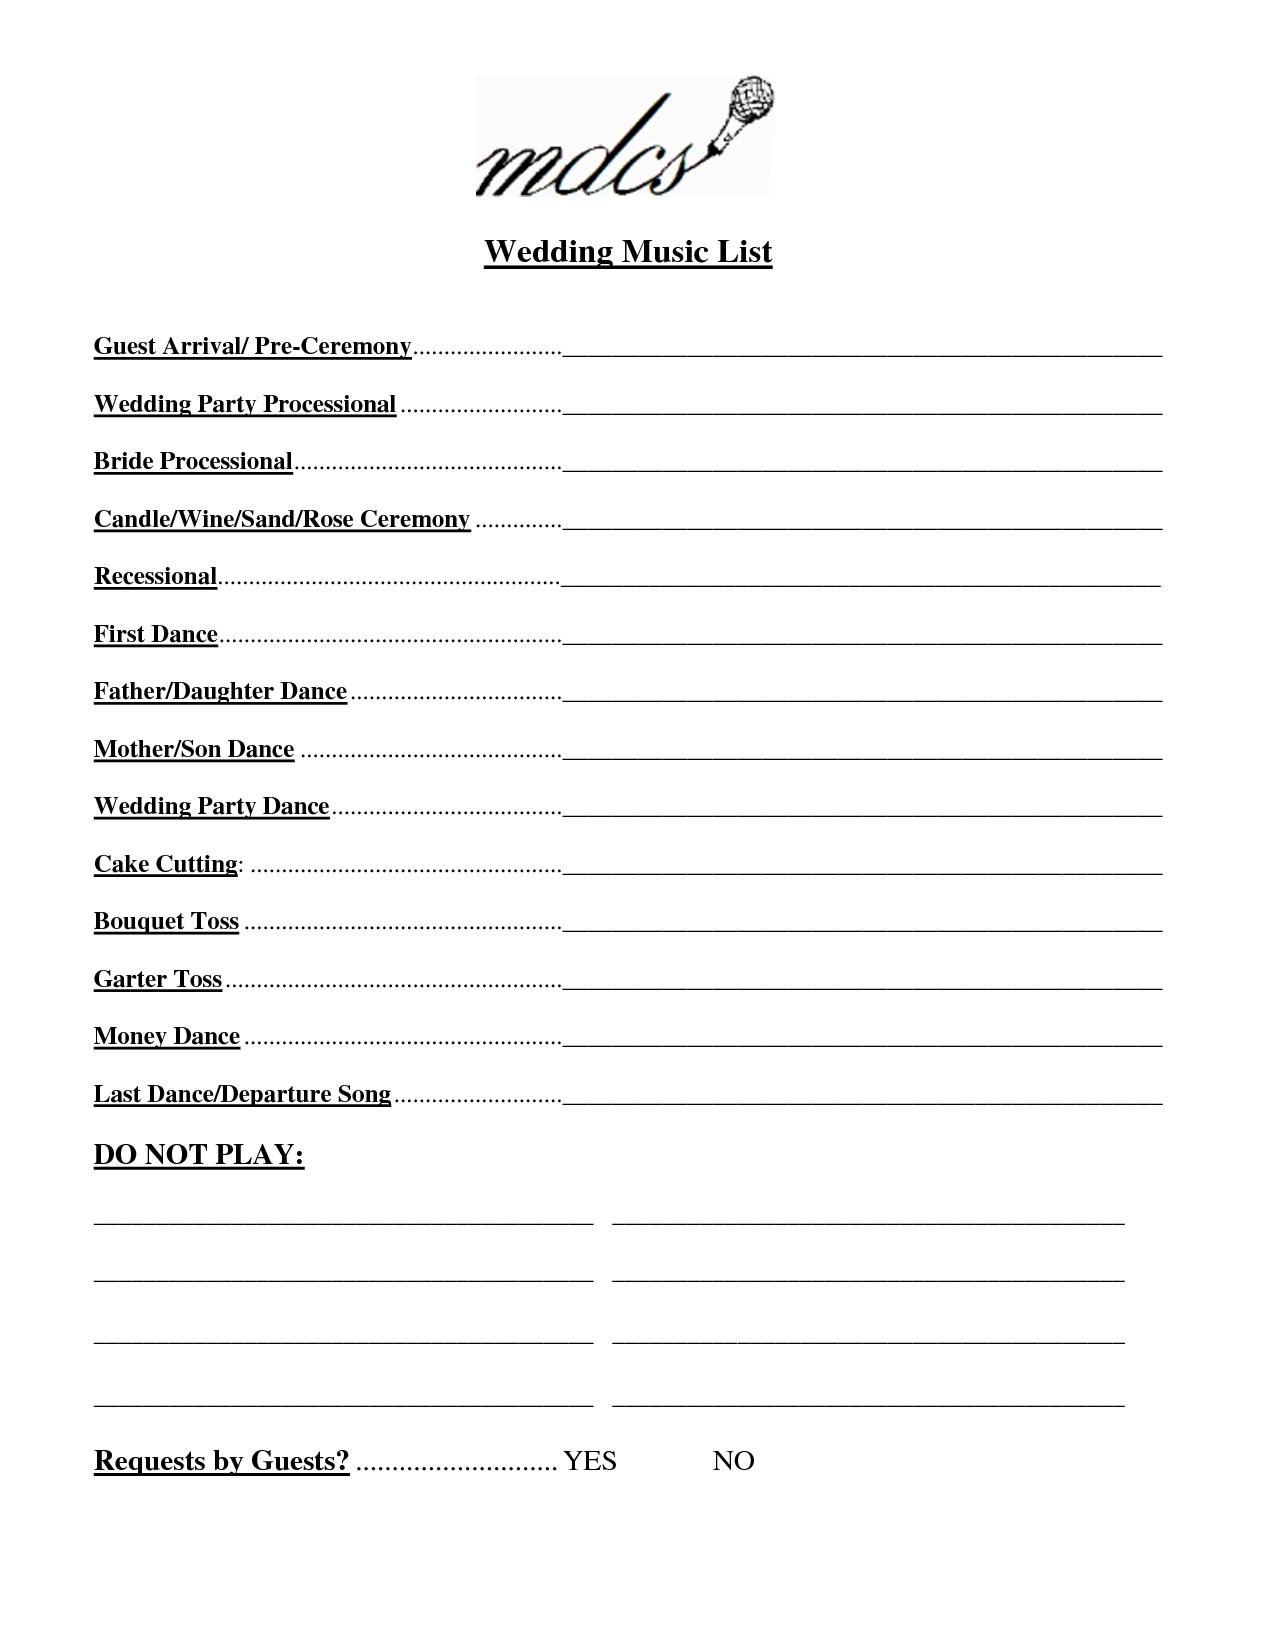 Wedding Party List Template Free | Fosterhaley Wedding Music List - Free Printable Wedding Party List